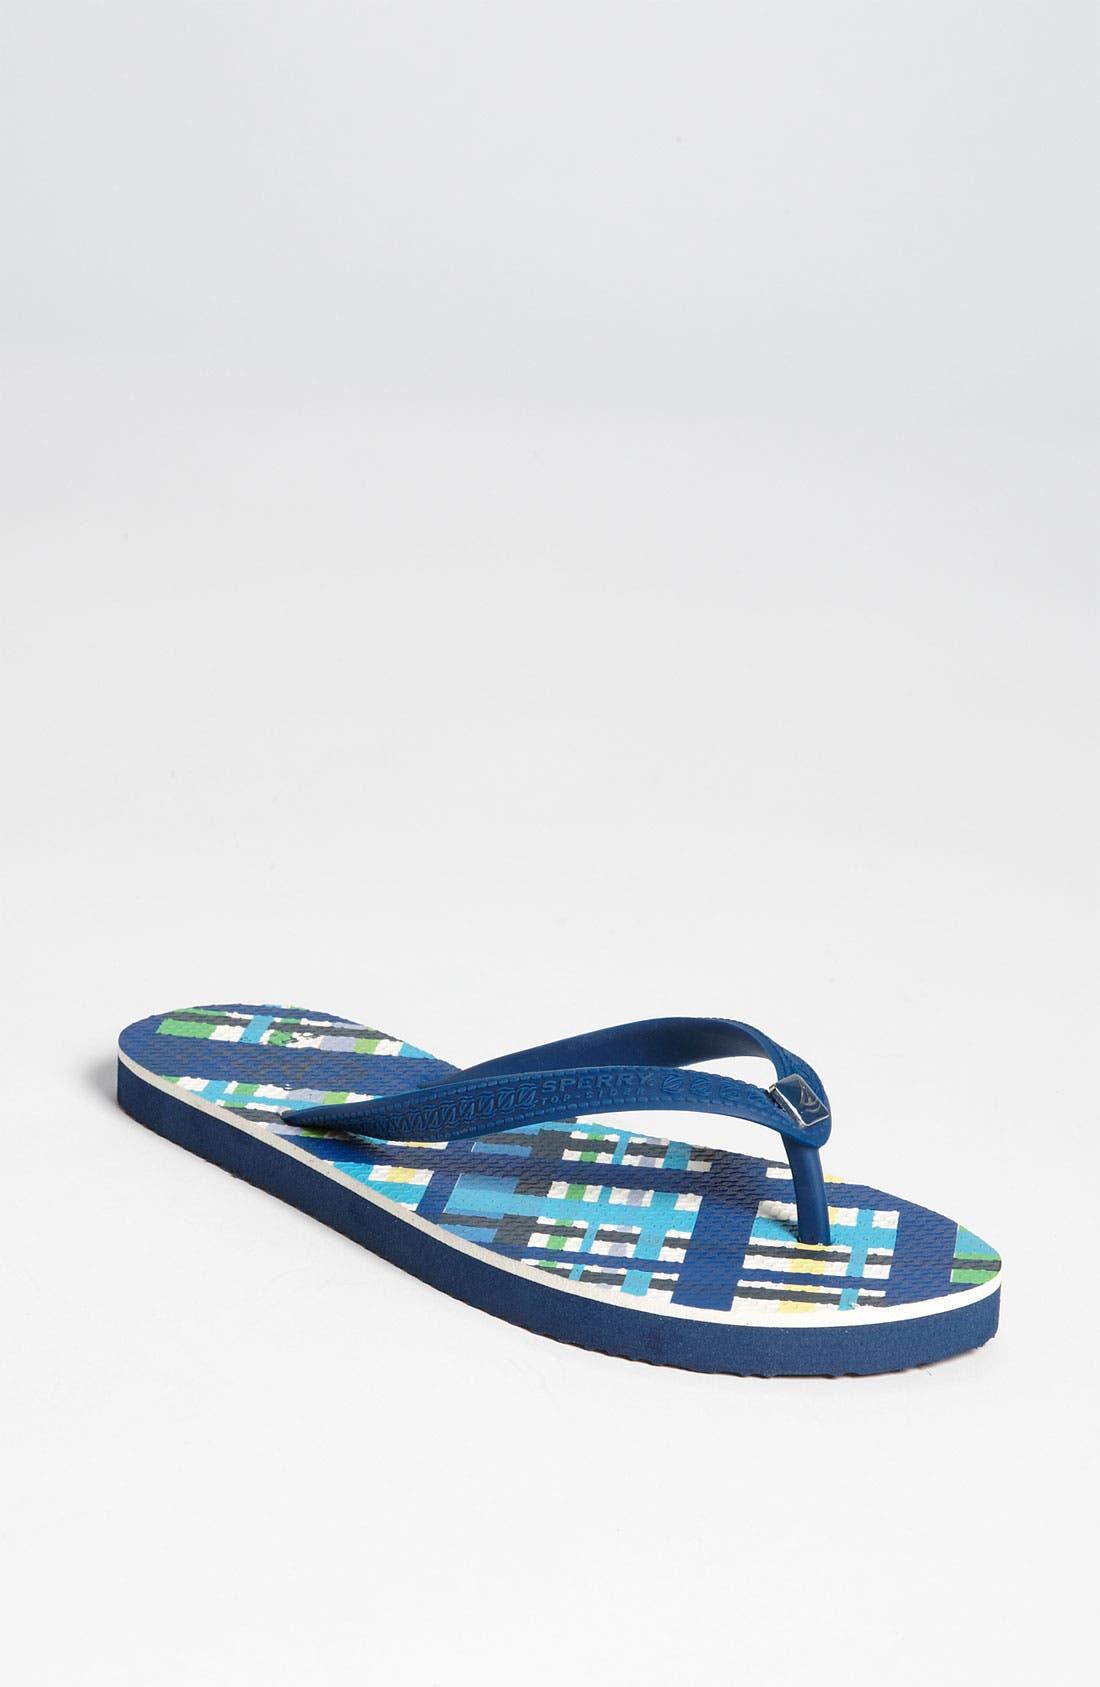 Main Image - Sperry Top-Sider® 'Seabury' Flip Flop